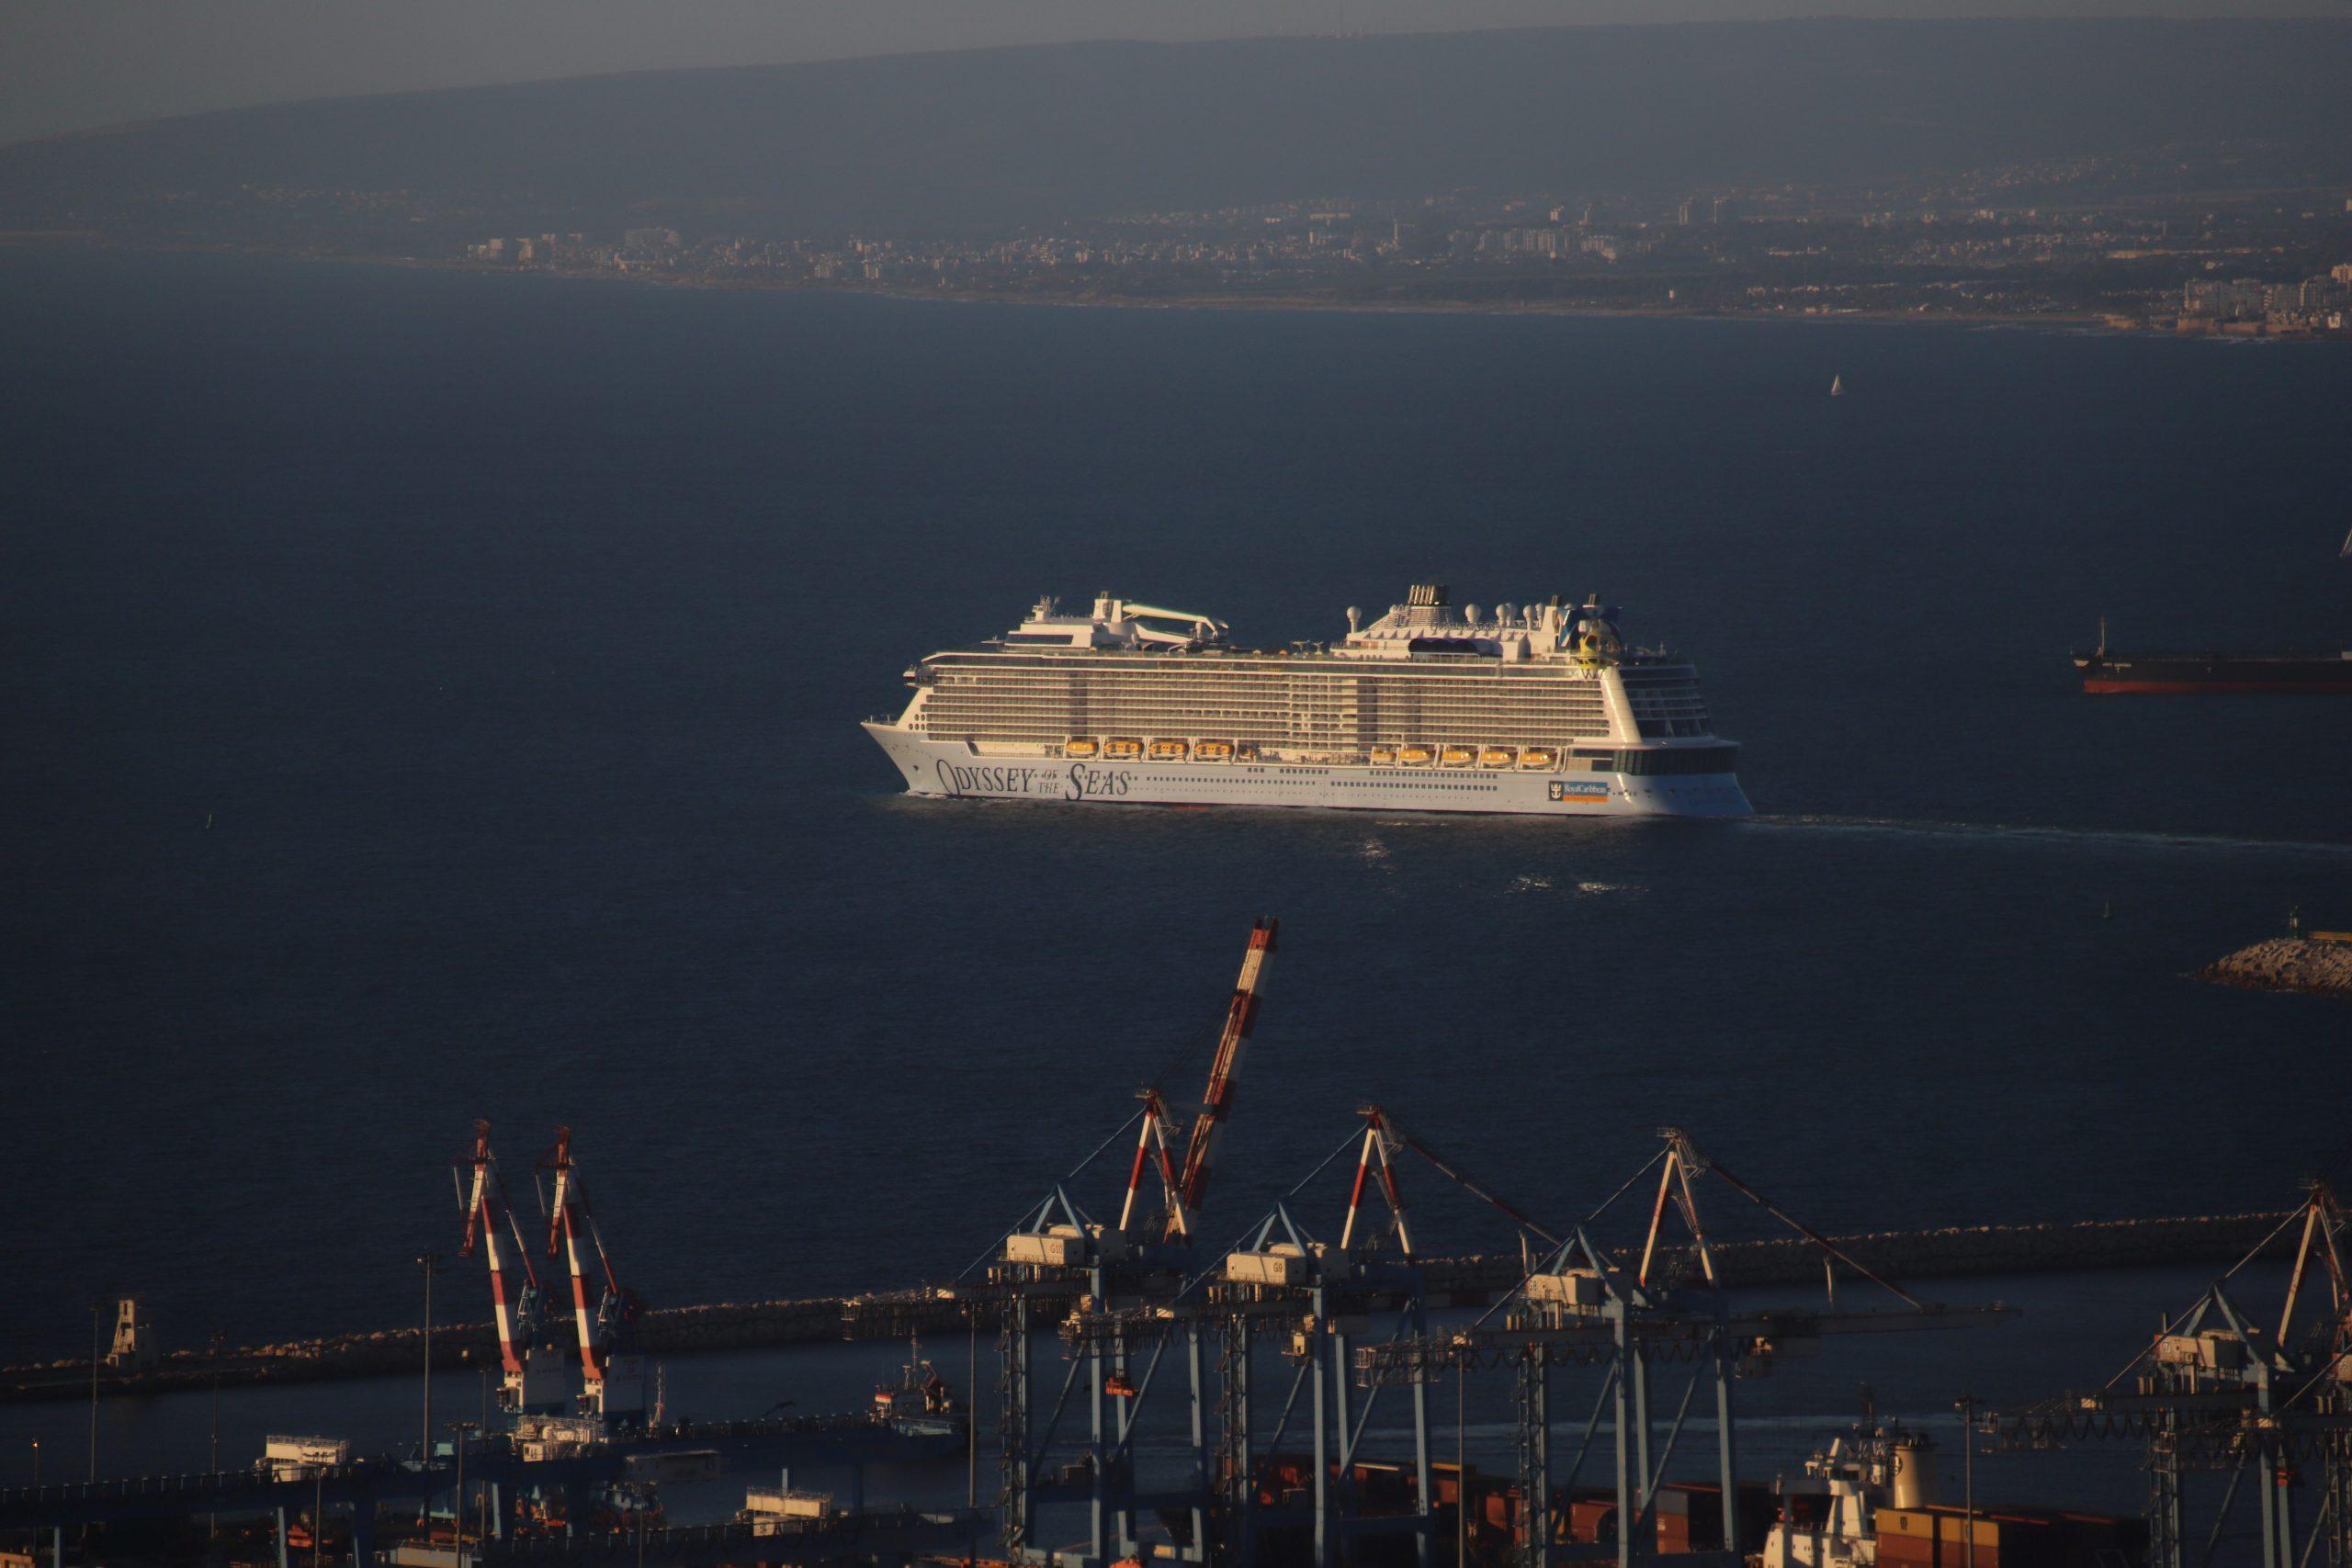 Odyssey Of The Seas Leaves Haifa for Limassol, Cyprus